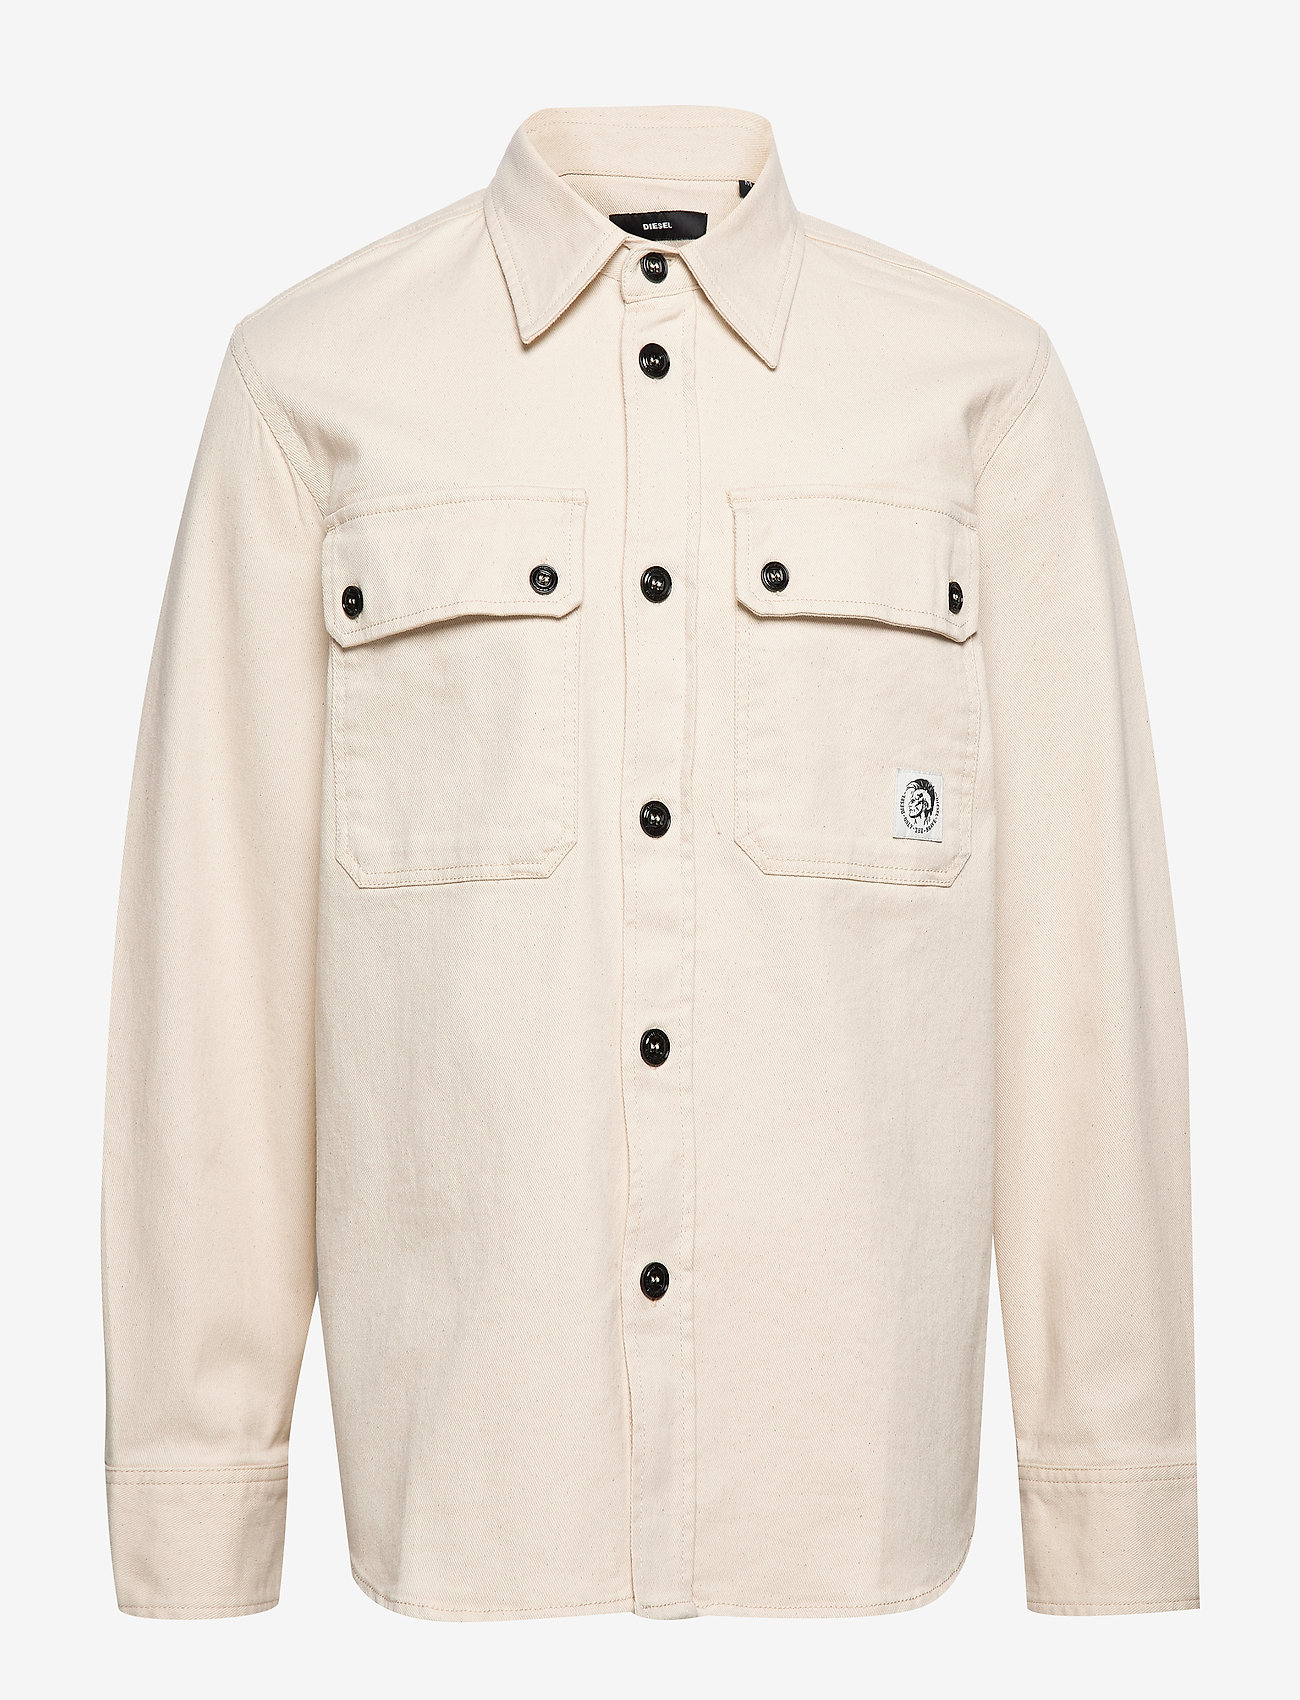 Diesel Men - S-JESSY SHIRT - podstawowe koszulki - vapourous gray - 0